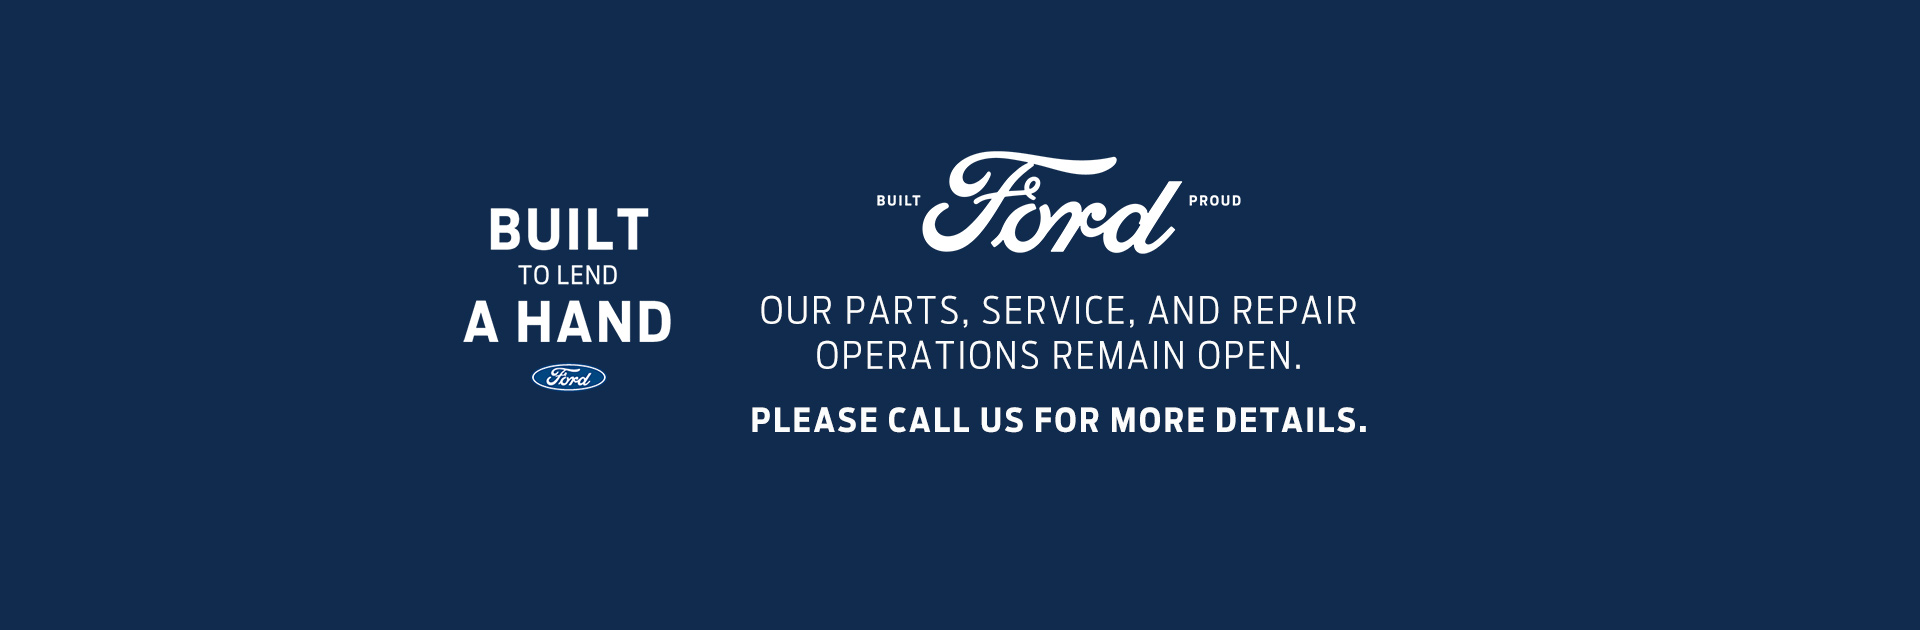 Fdaf Fordcredit 1920x630 Lendahand